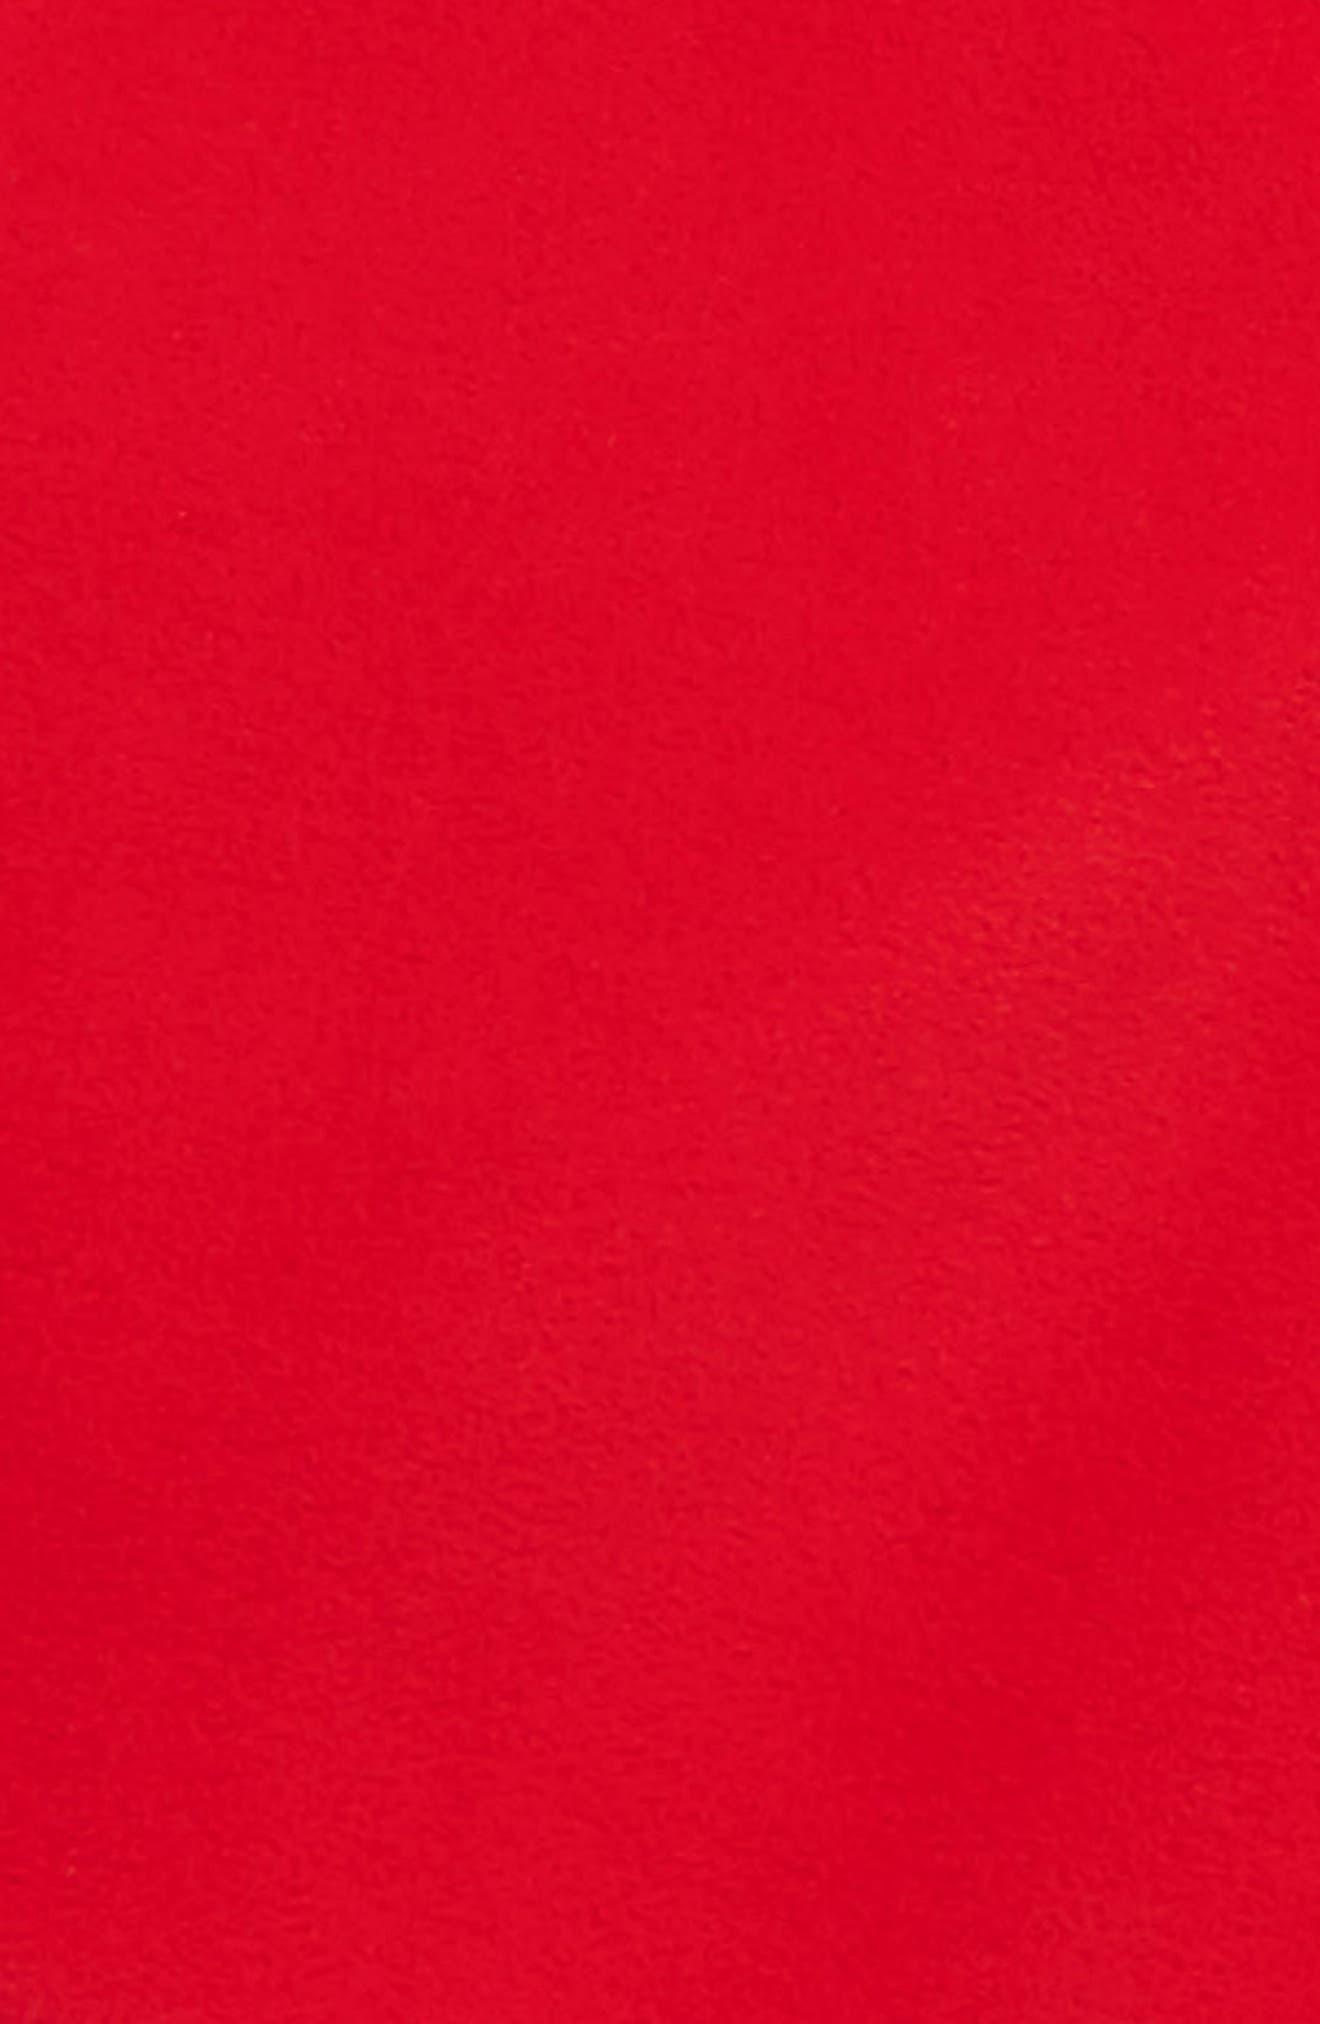 'Chimborazo' Hoodie,                             Alternate thumbnail 2, color,                             TNF RED/ GRAPHITE GREY